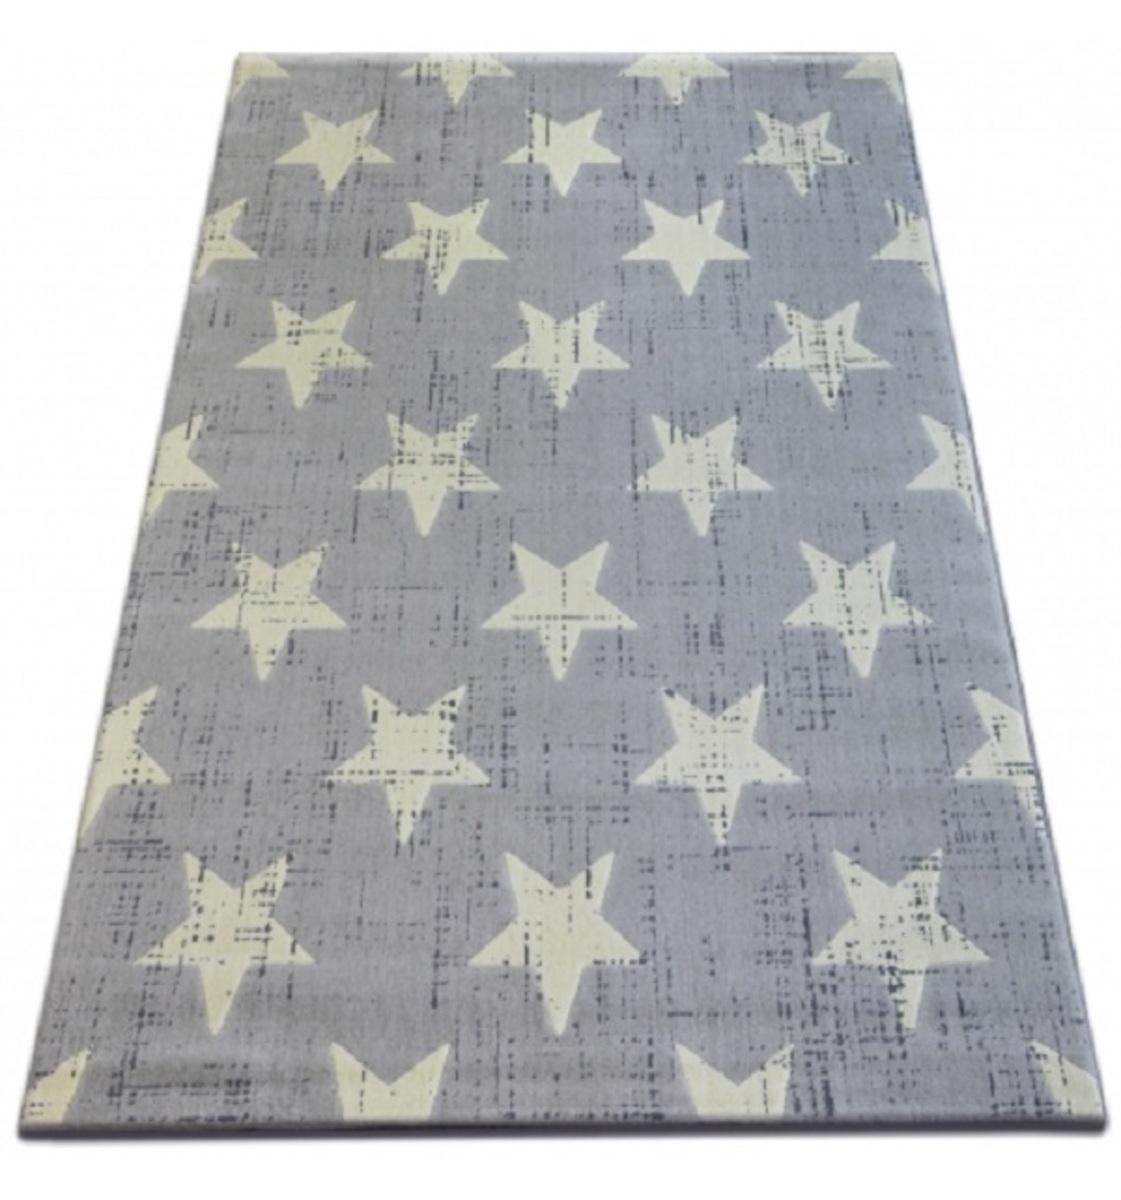 Detský koberec šedý - hviezdičky 140 x 200 cm